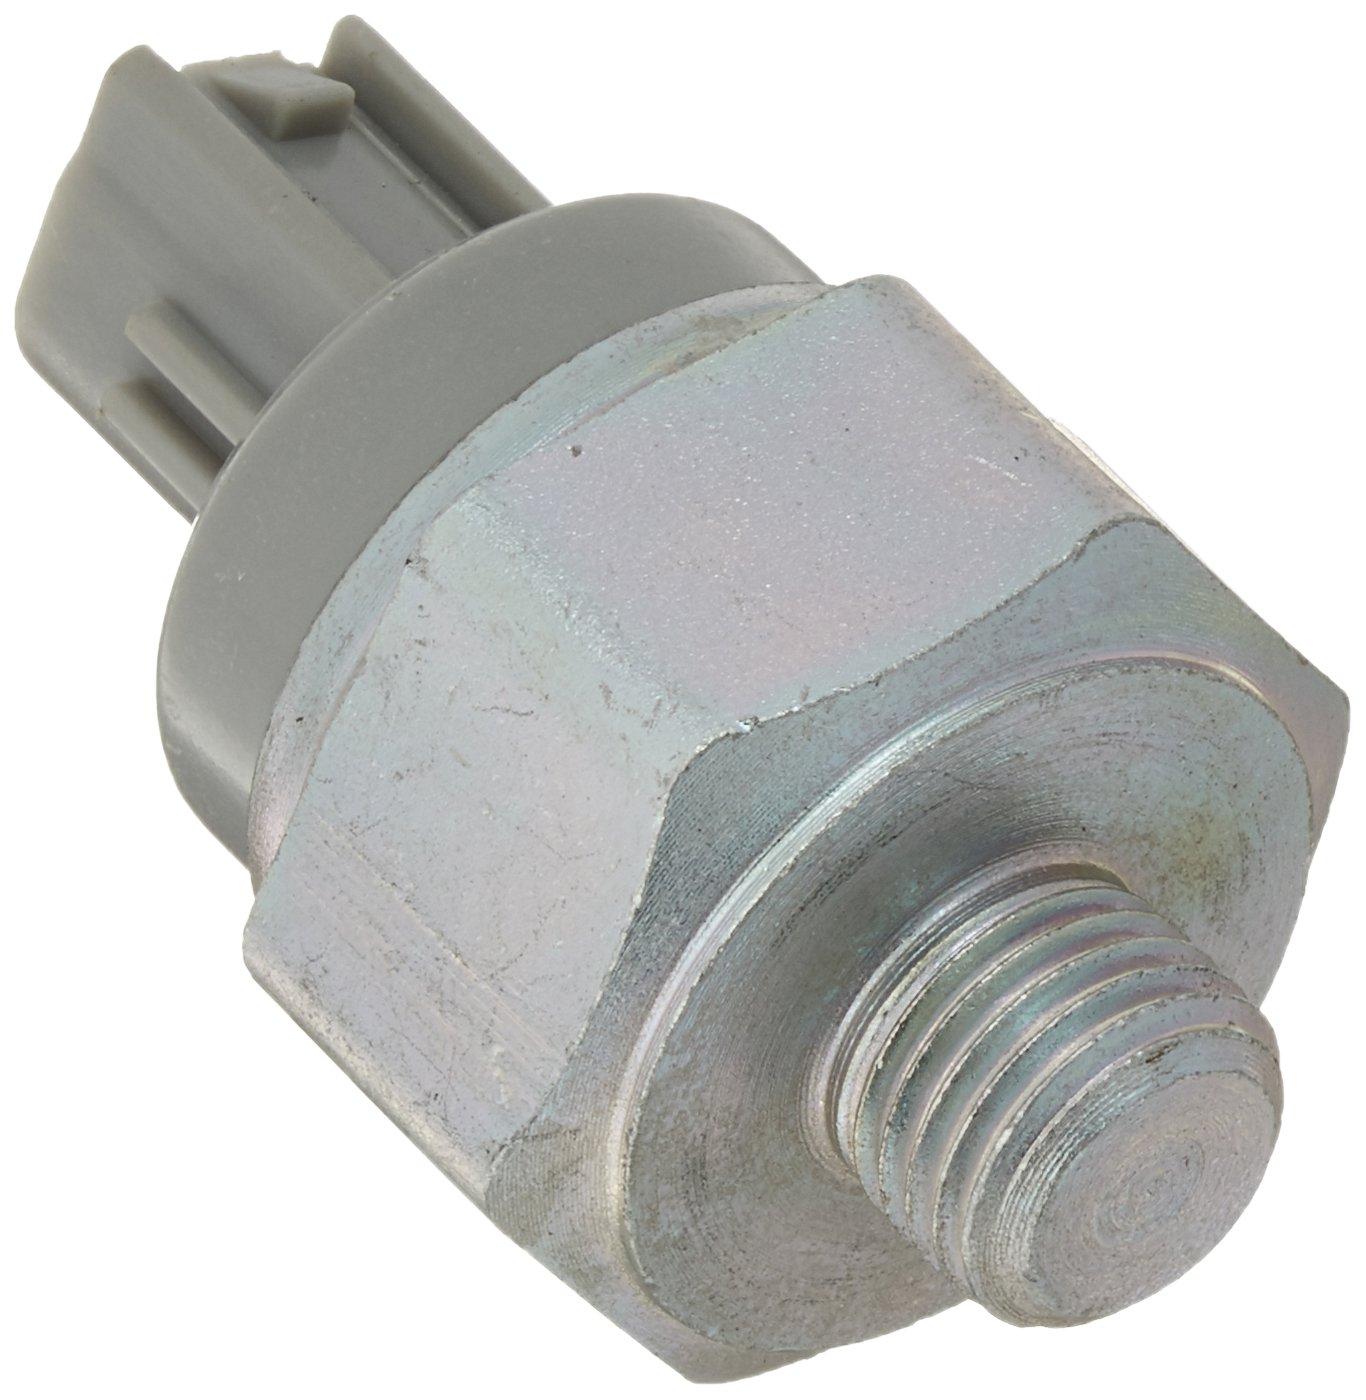 MTC 1010648 / 89615-30050 Knock Sensor (89615-30050 MTC 1010648) by MTC